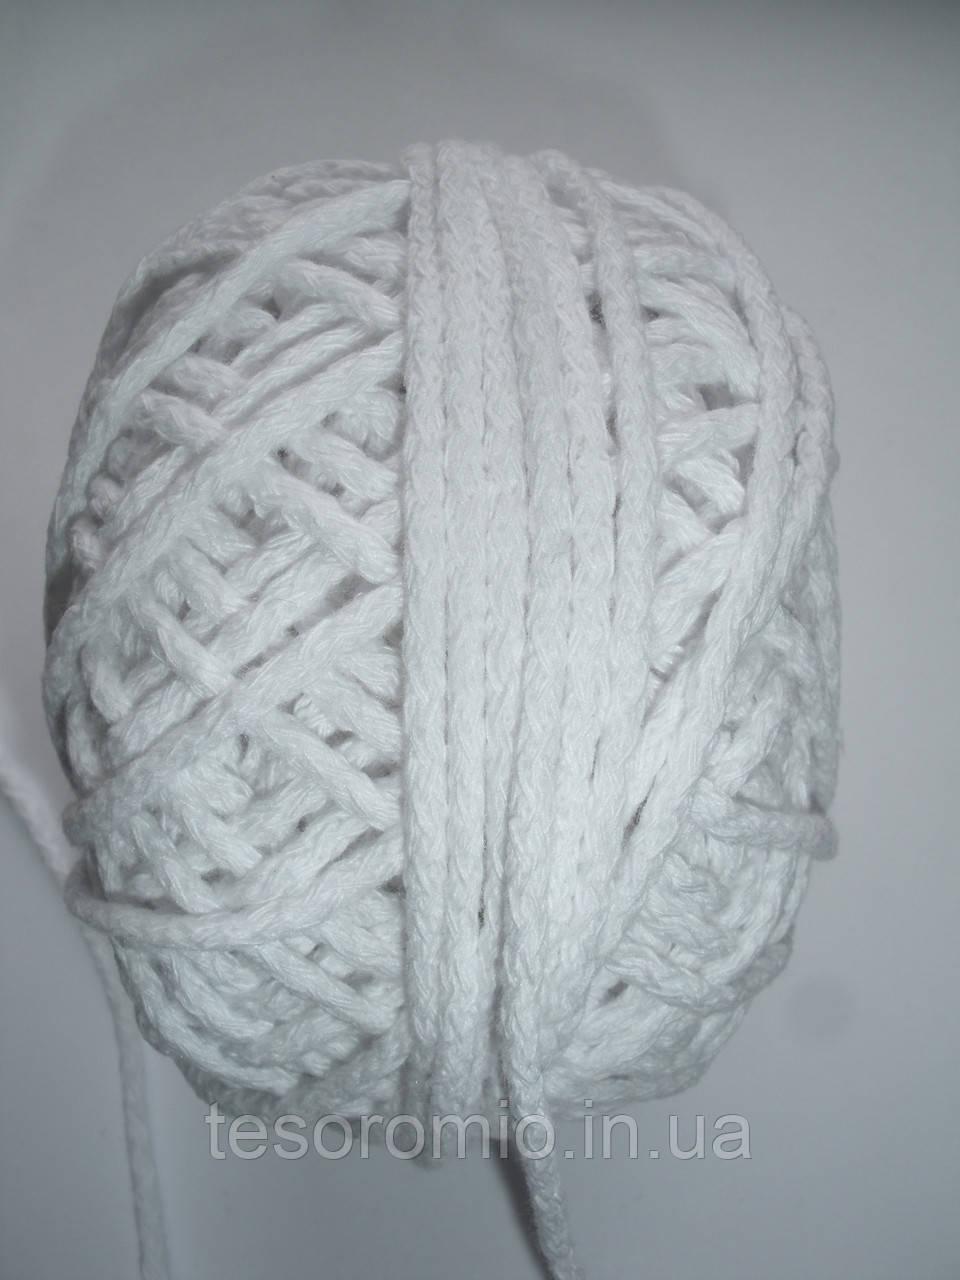 Шнур хлопковый 3мм диаметр белый